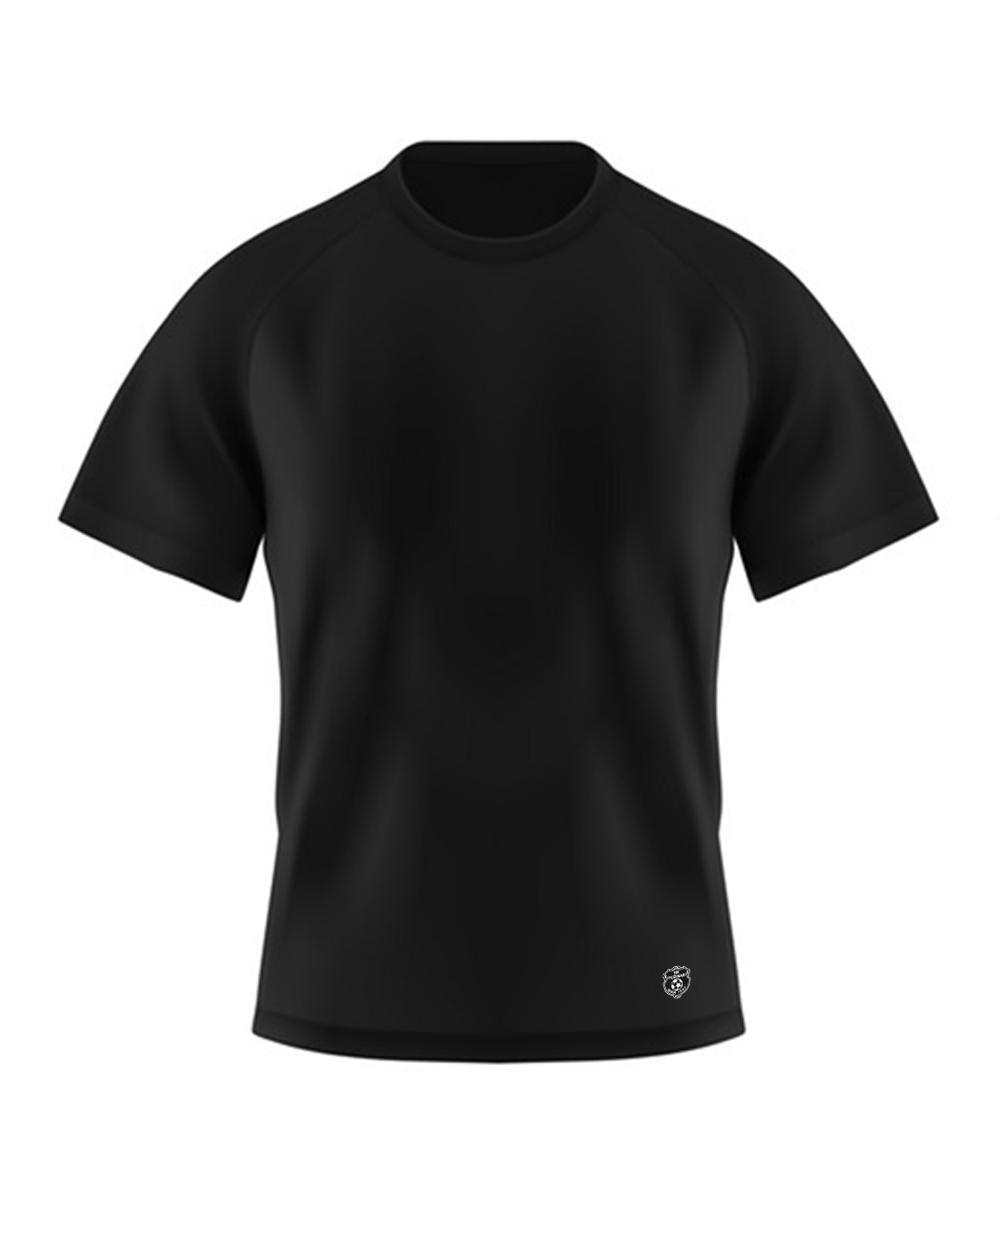 Majica #blackisnewred